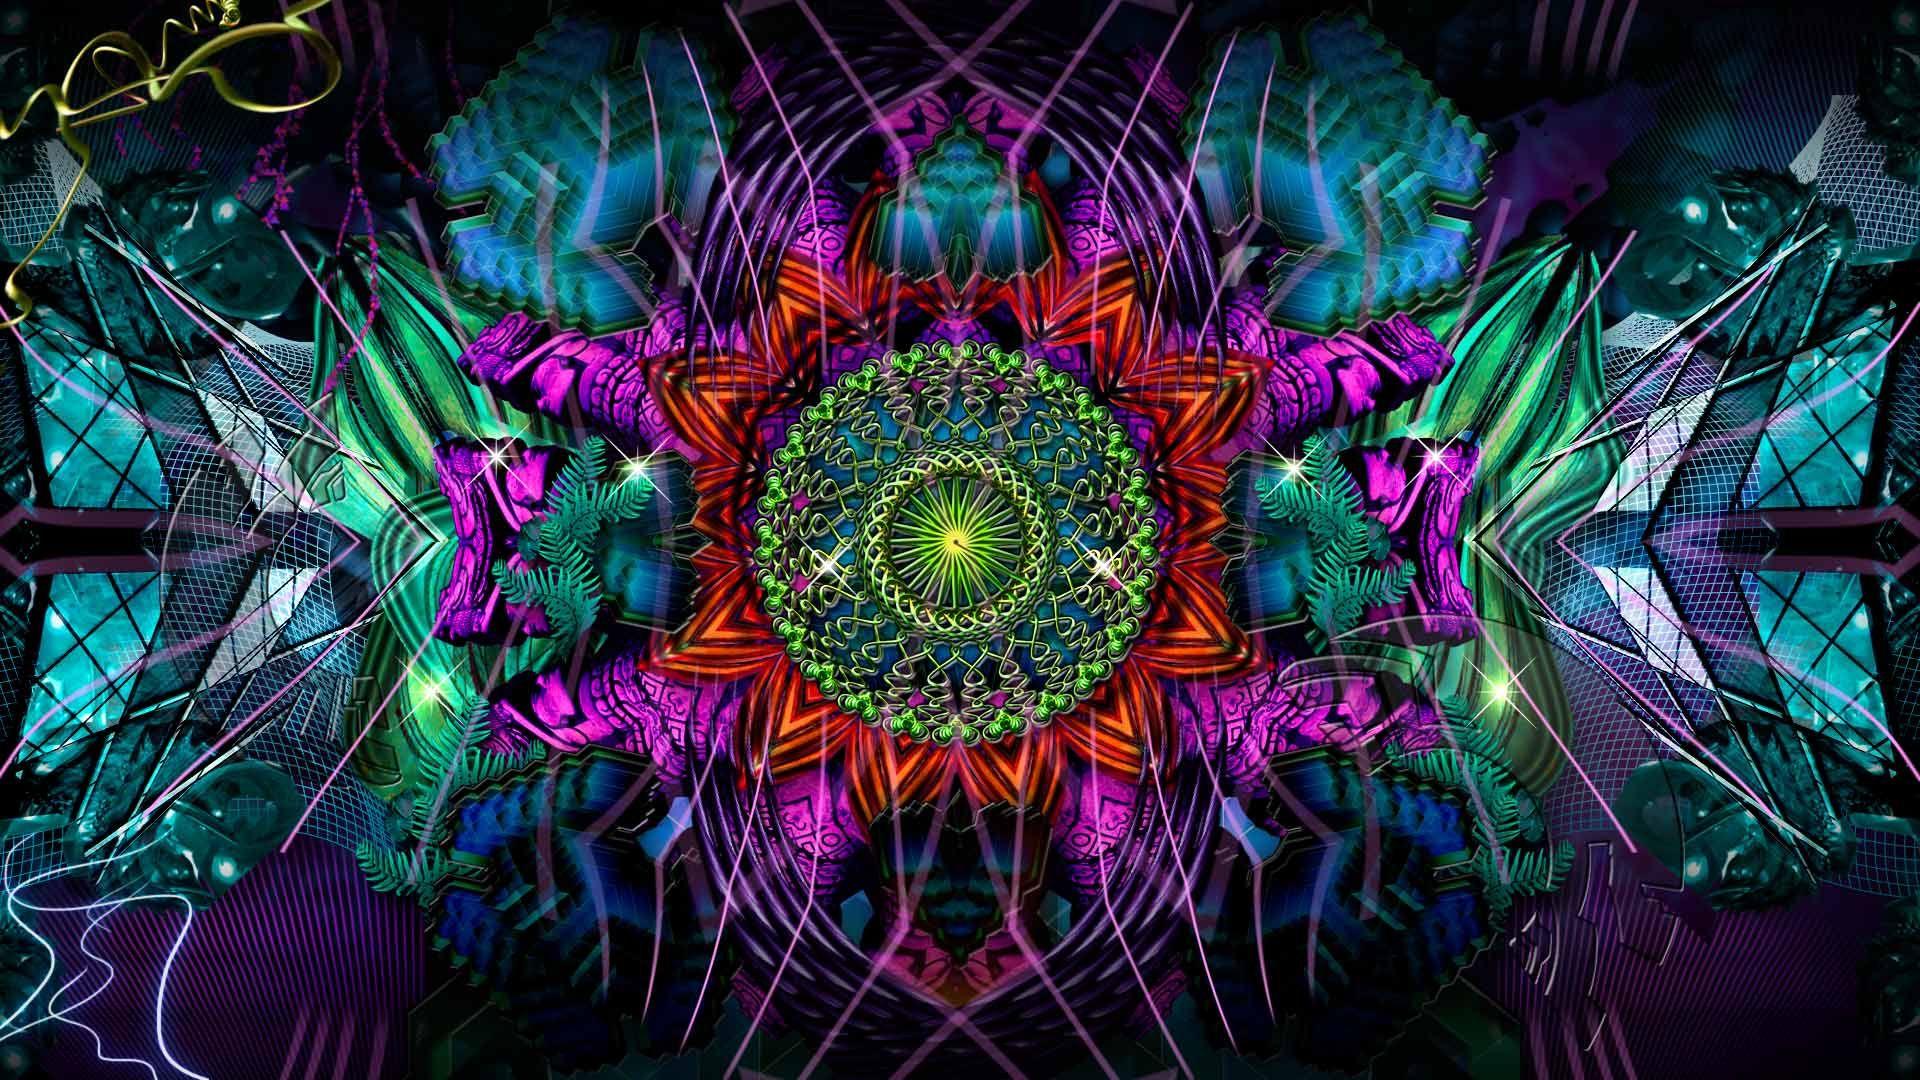 psytrancemusicdownloada.jpg (1920×1080) Mandalas, 4k hd